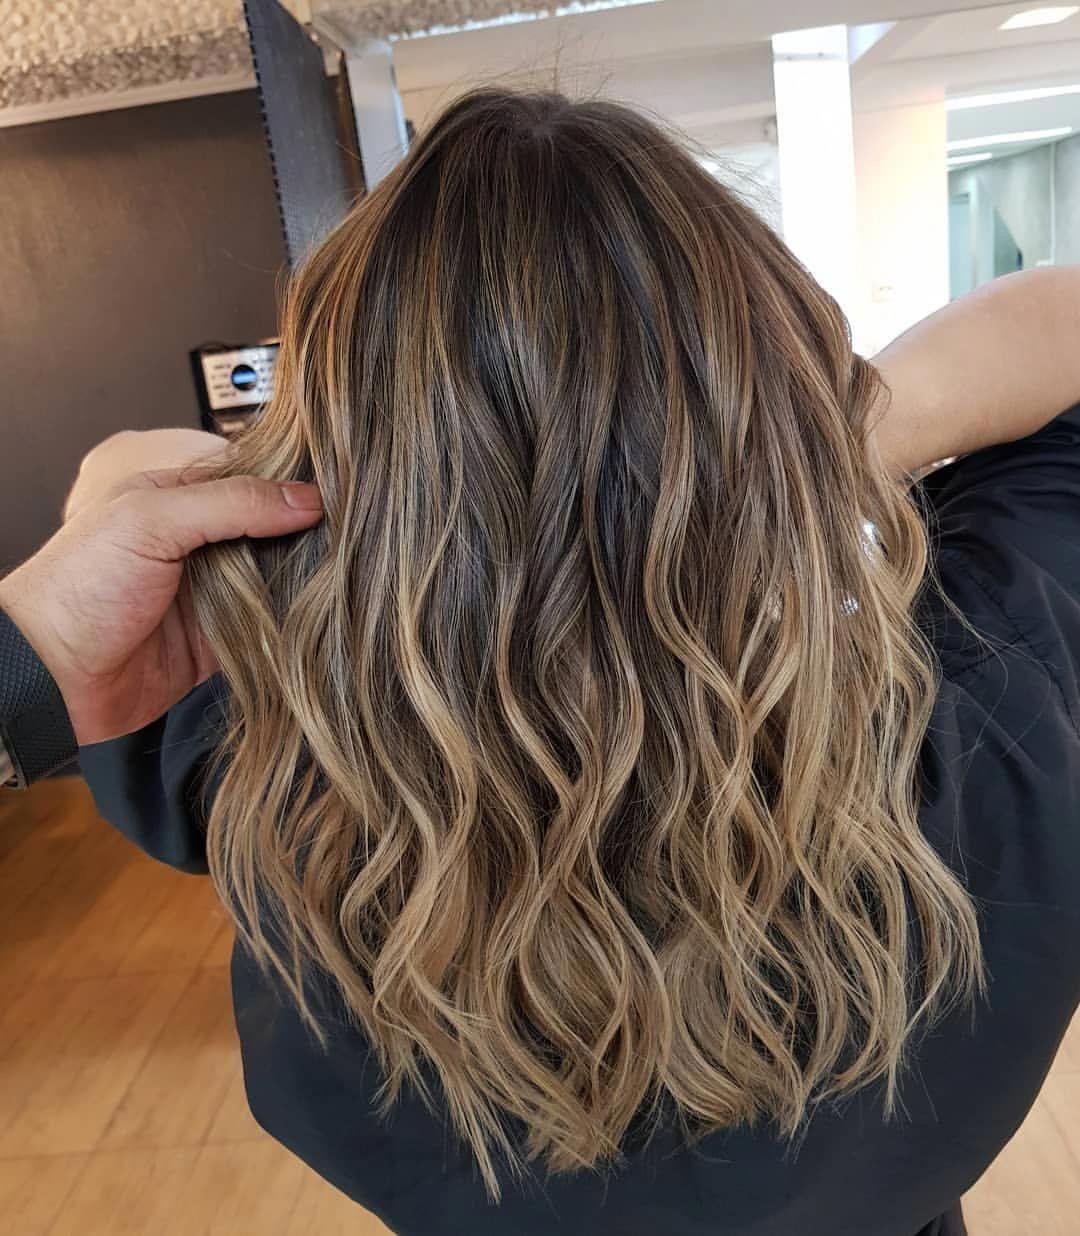 20 Stunning Examples Of Mushroom Brown Hair Color Brown Hair With Highlights Brown Blonde Hair Brown Hair With Highlights And Lowlights